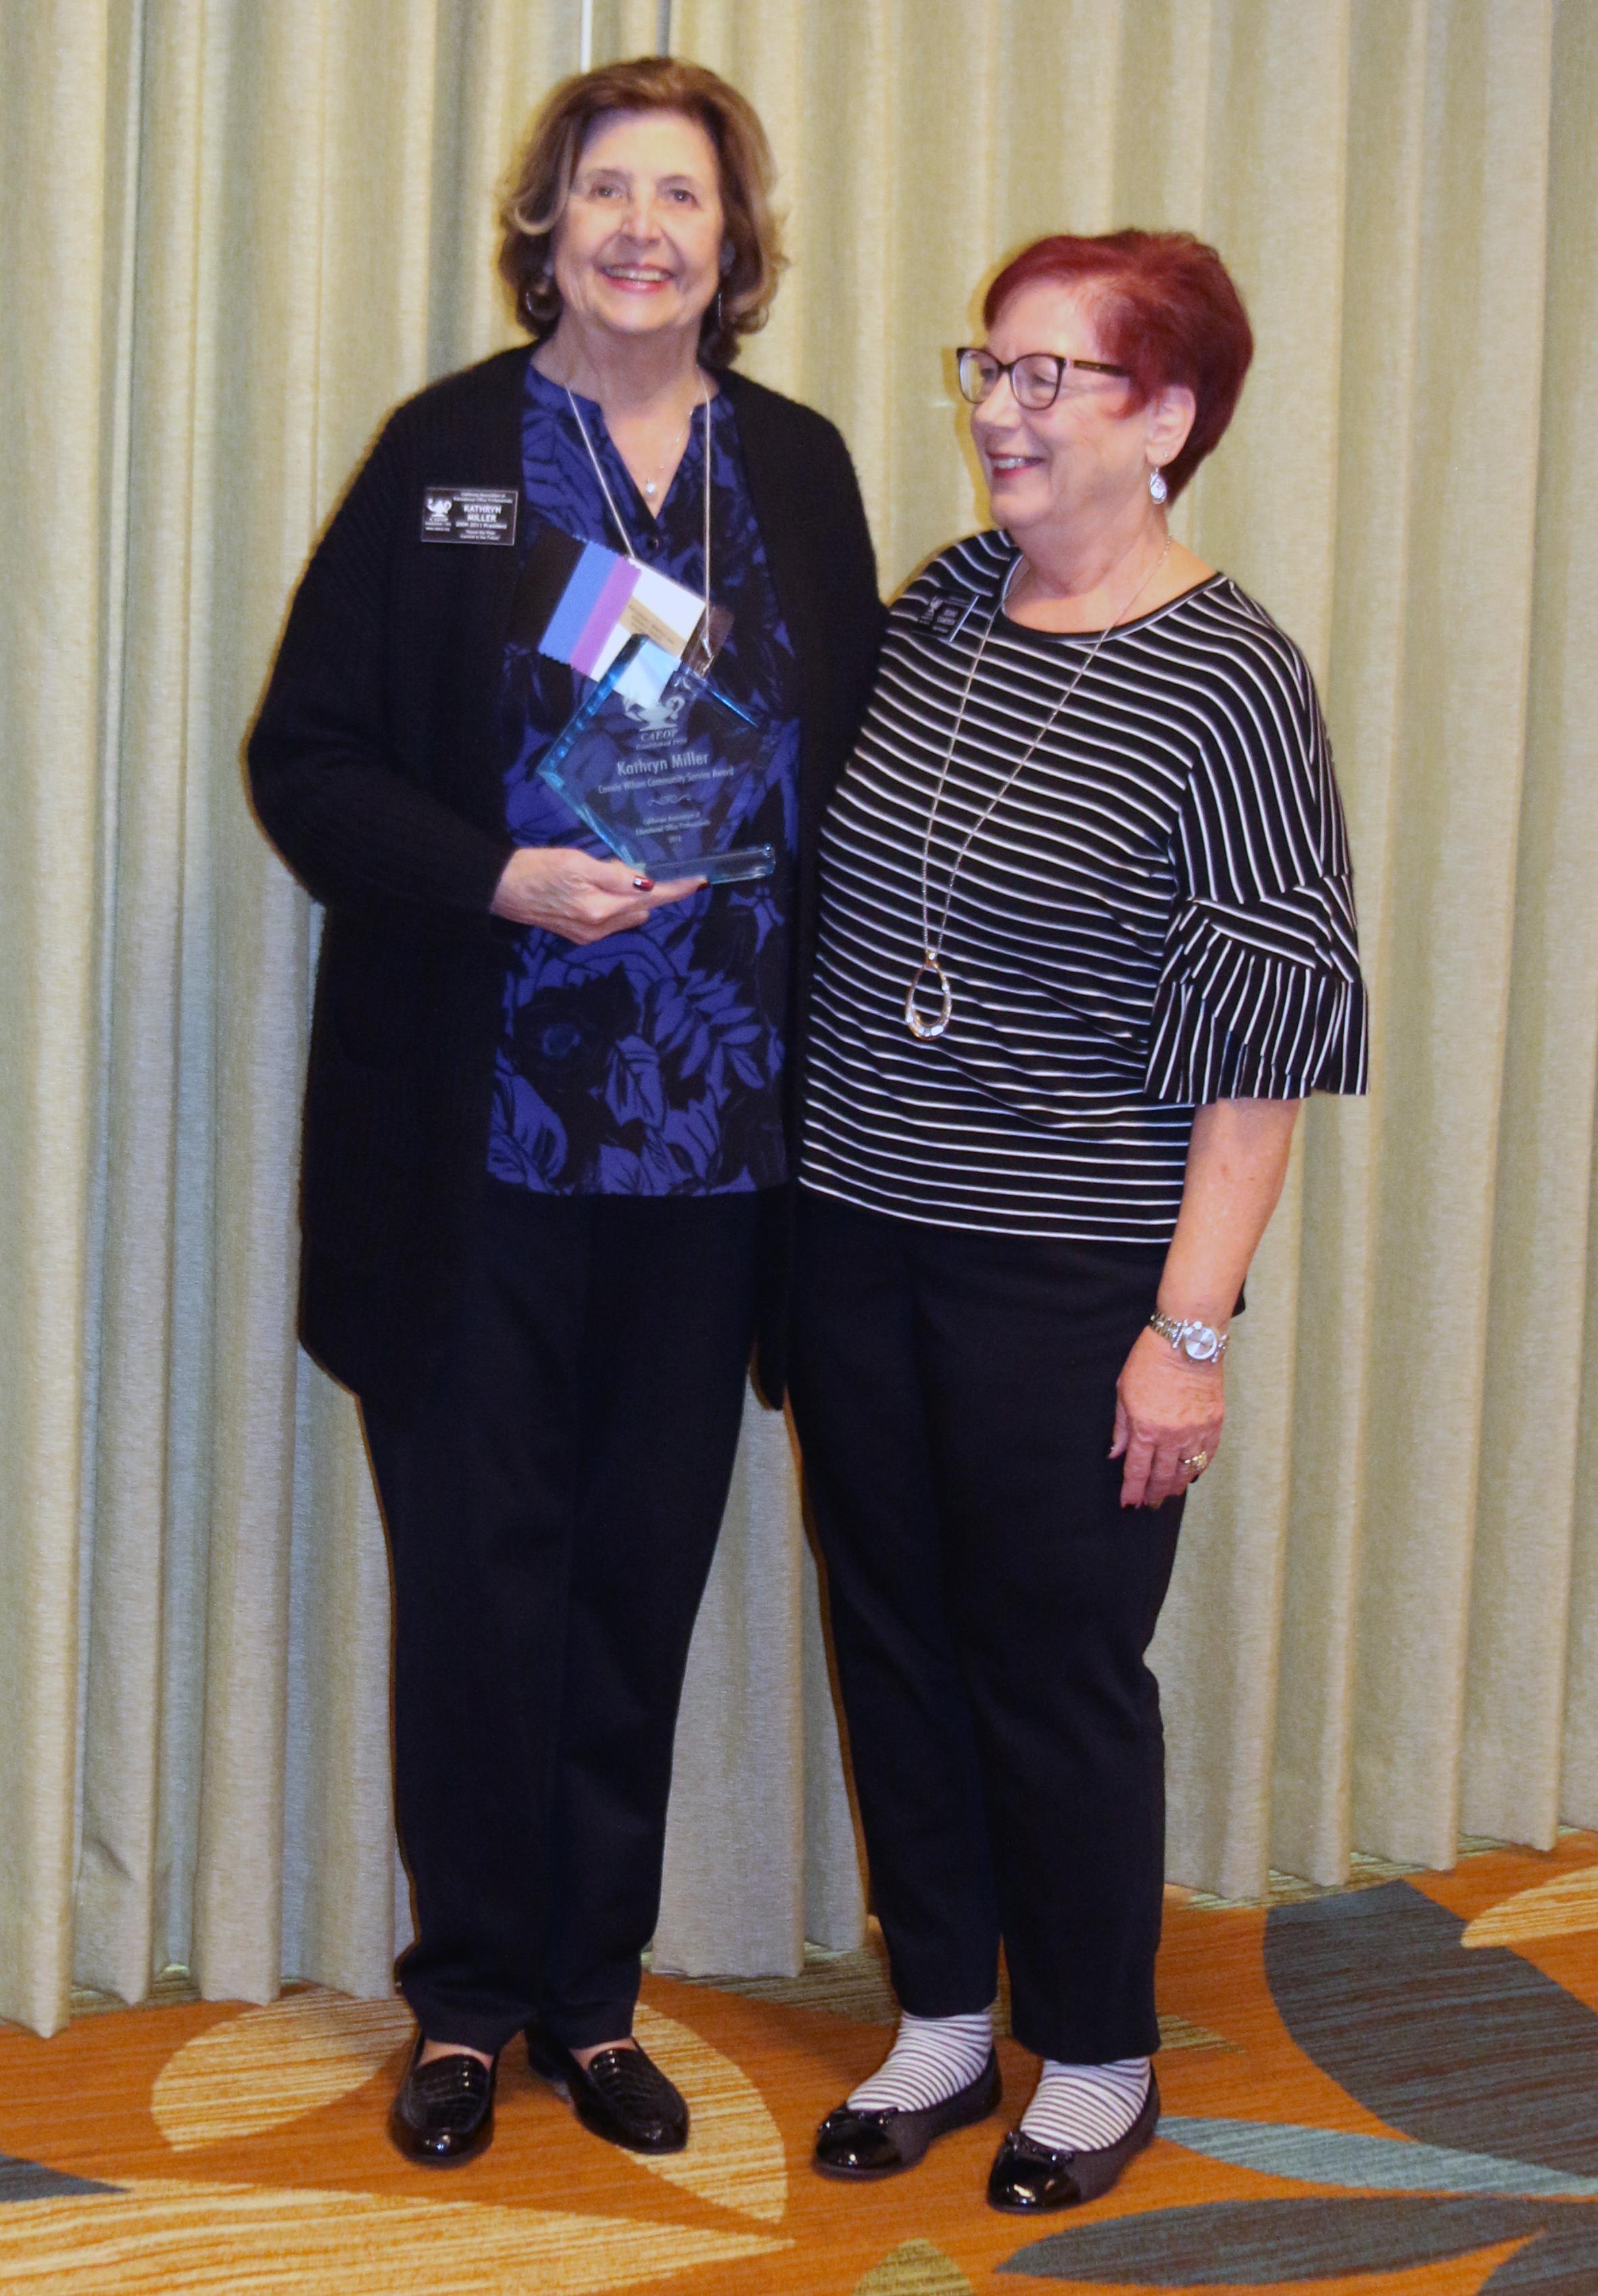 Kathryn Miller, CEOE was awarded the 2019 Connie Wilson Community Service Award